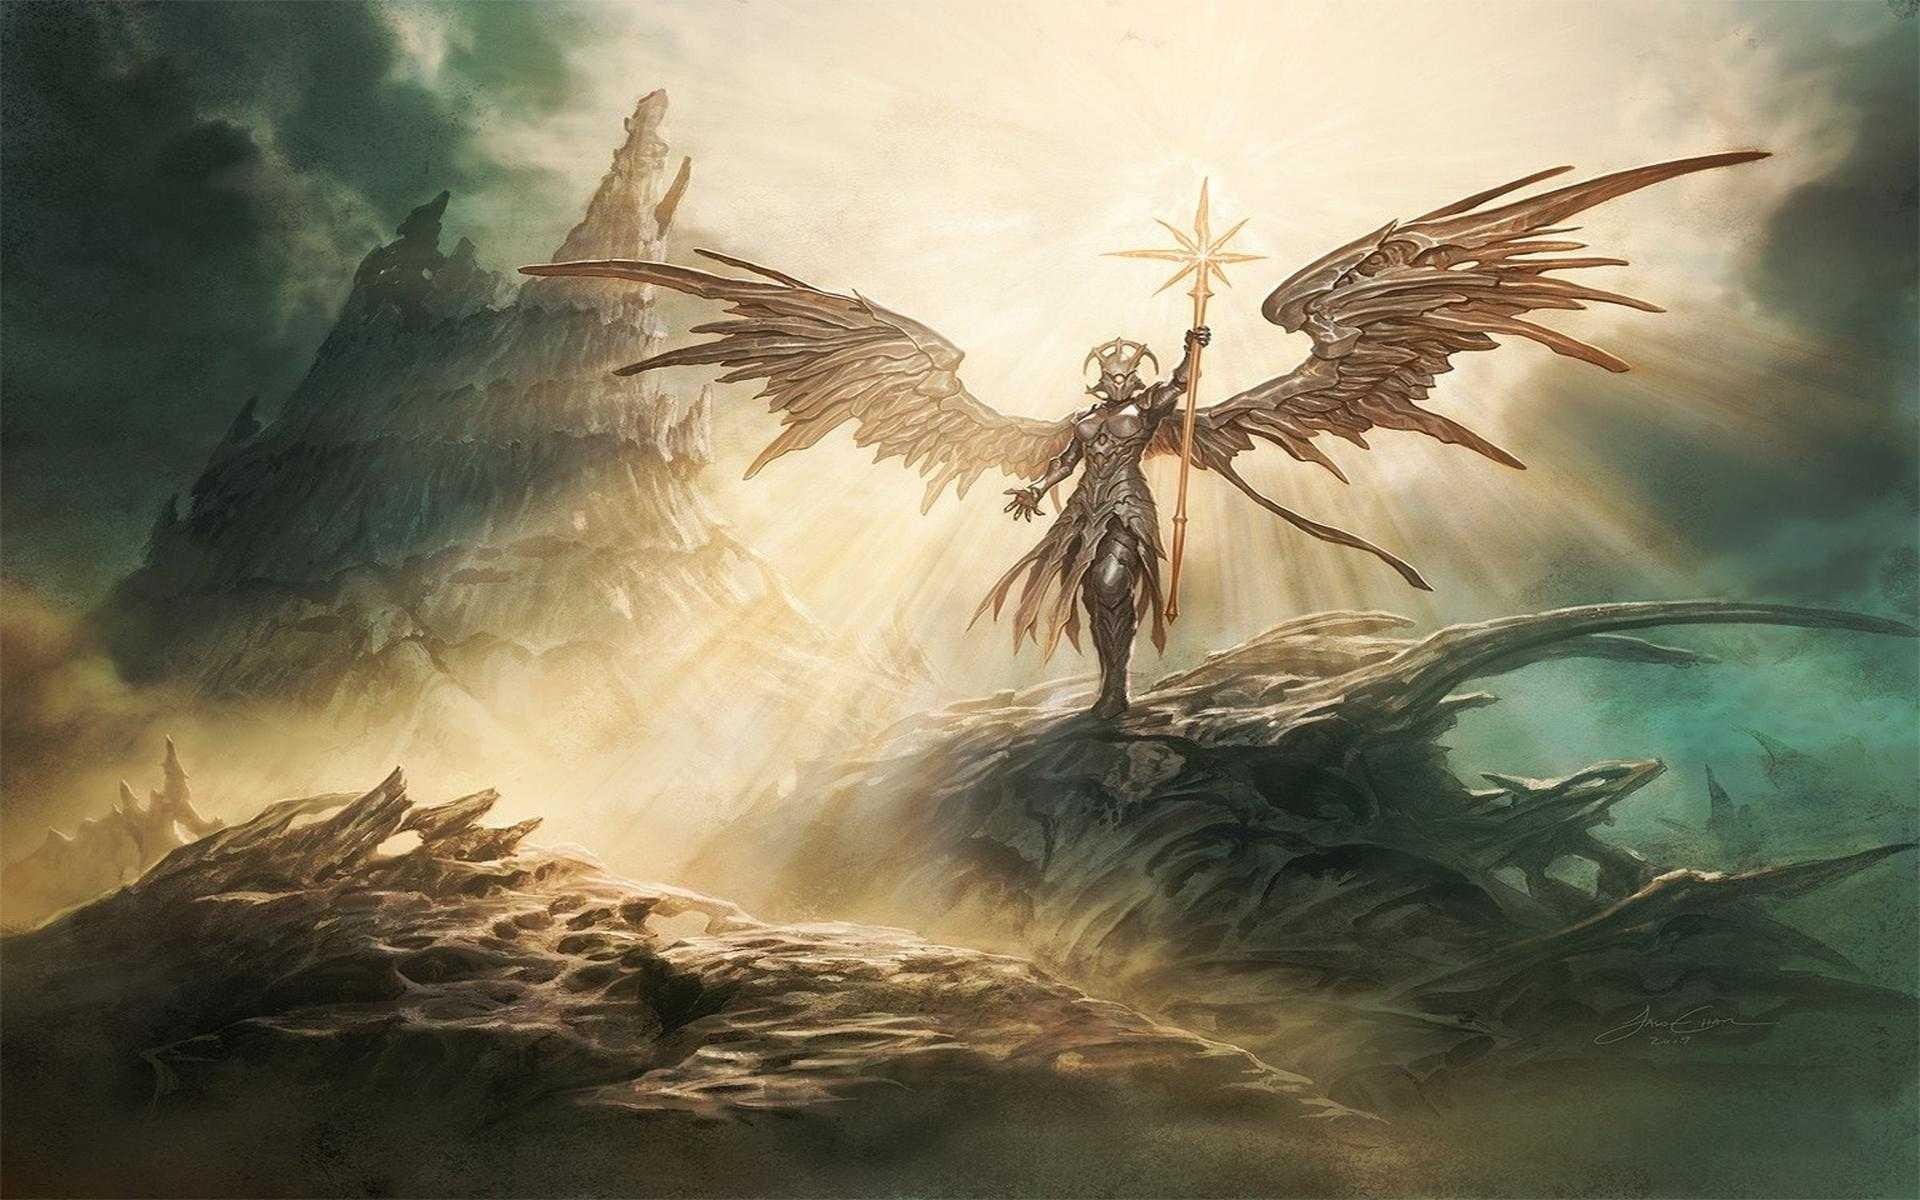 Fantasy Art Wings Angel Magic The Gathering Mythology Wing Screenshot Computer Wallpaper Fictional Character